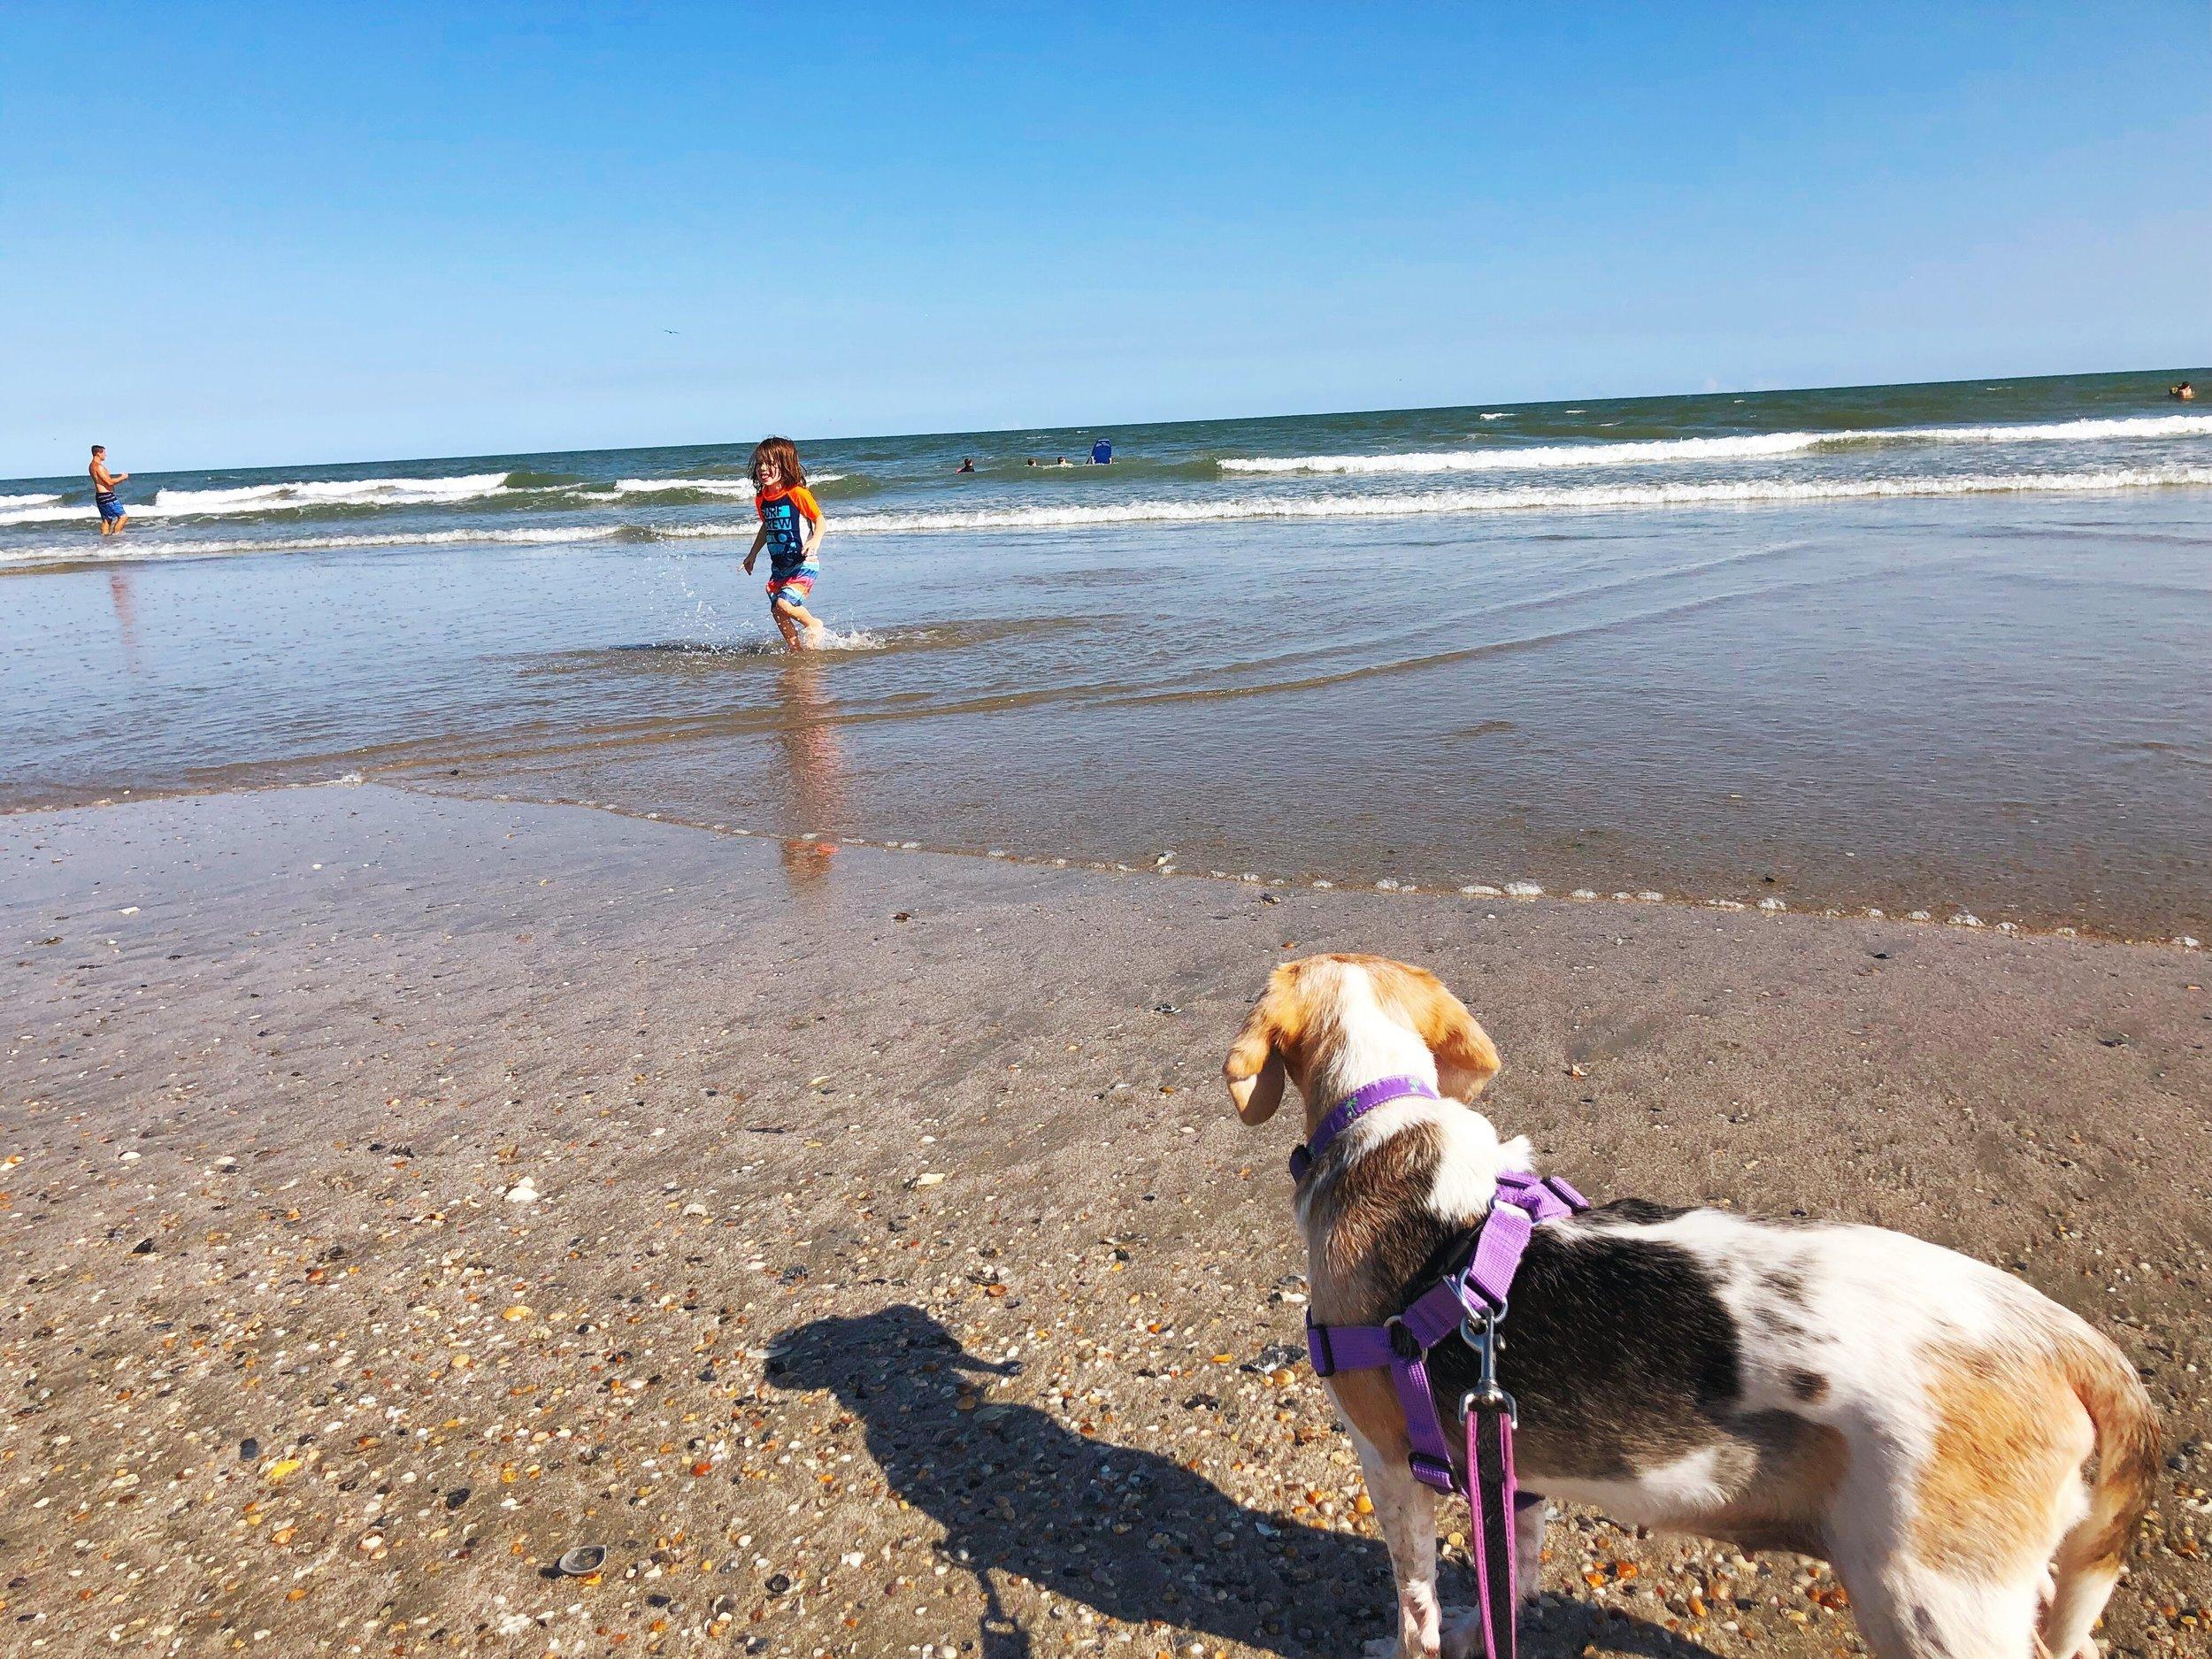 Ruby Skye and B at the beach